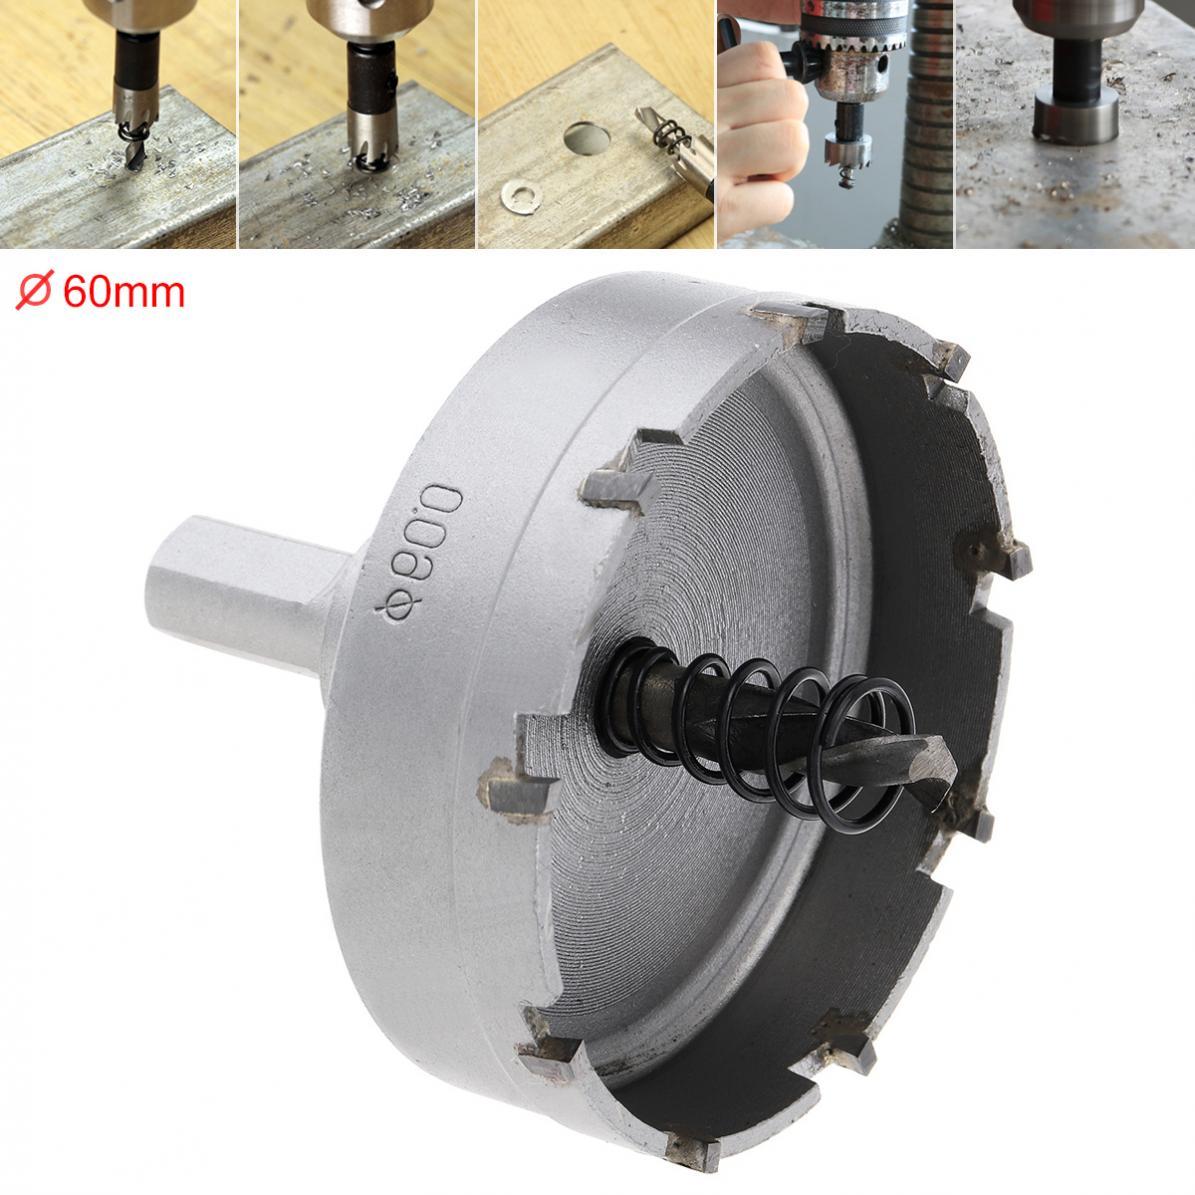 HSS Hole Saw 60mm Drill Bit Carbide Cutter Head  High Speed Steel Hss Drill Set Hole For Stainless Steel Metal Alloy Cutter